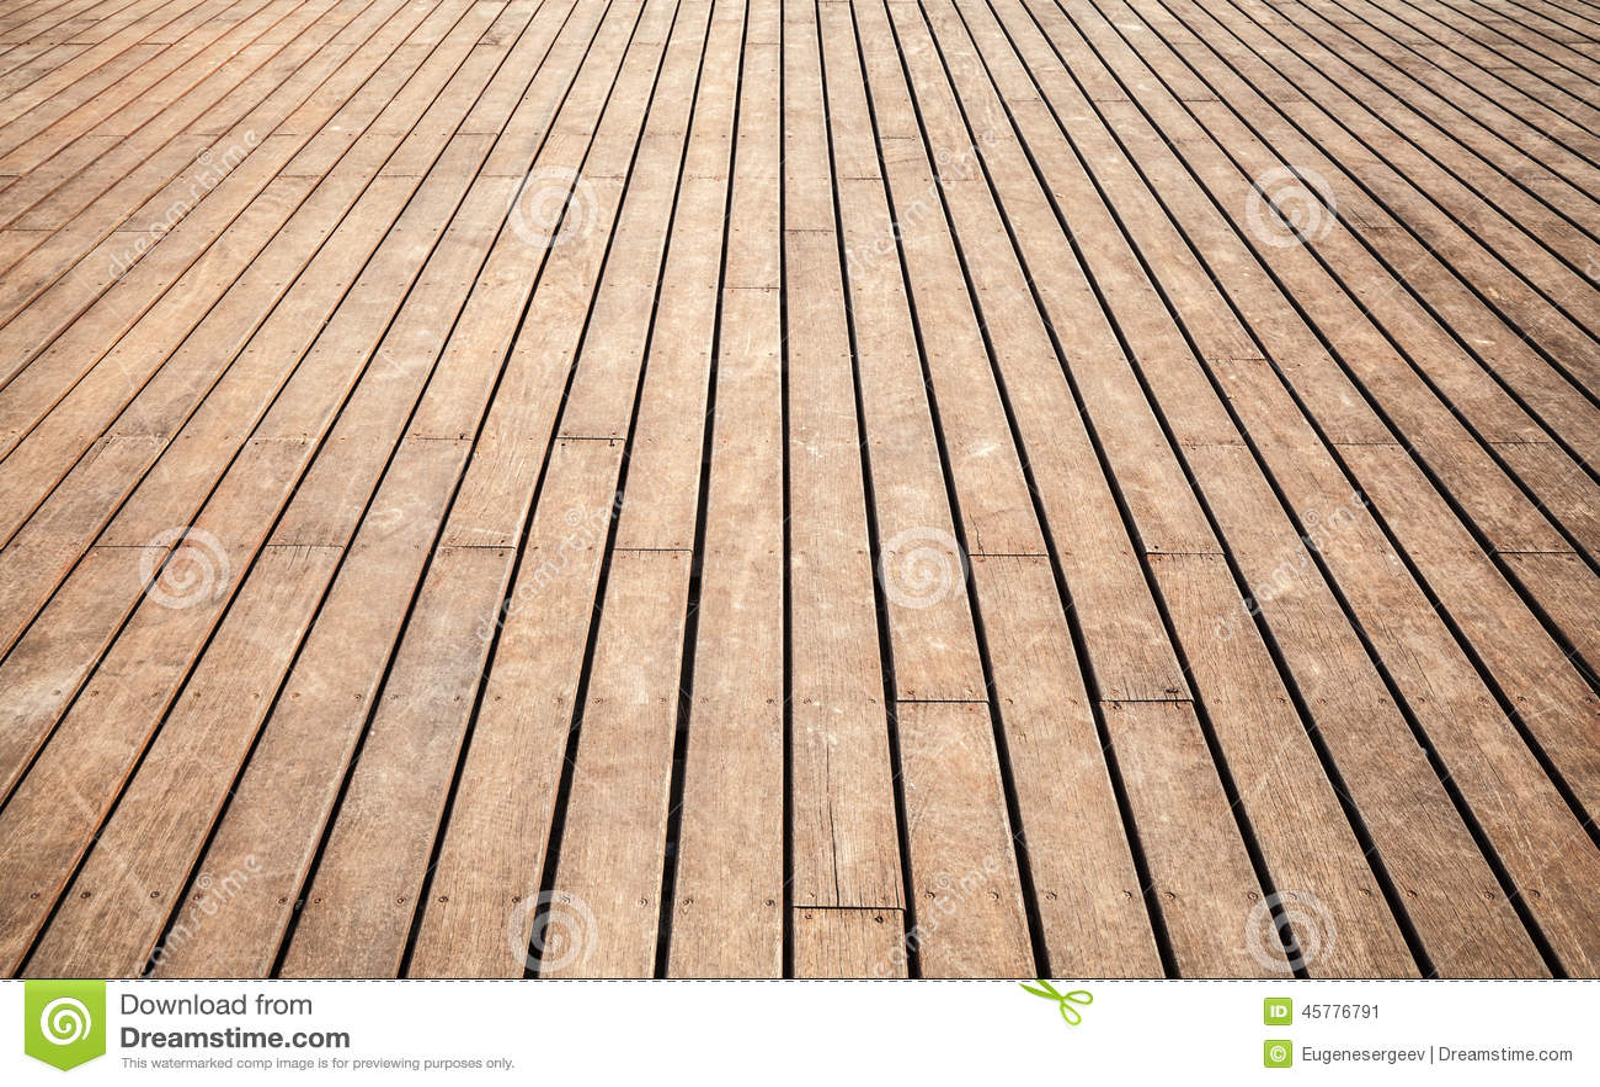 vieja perspectiva de madera del piso textura del fondo imagen de archivo imagen 45776791. Black Bedroom Furniture Sets. Home Design Ideas